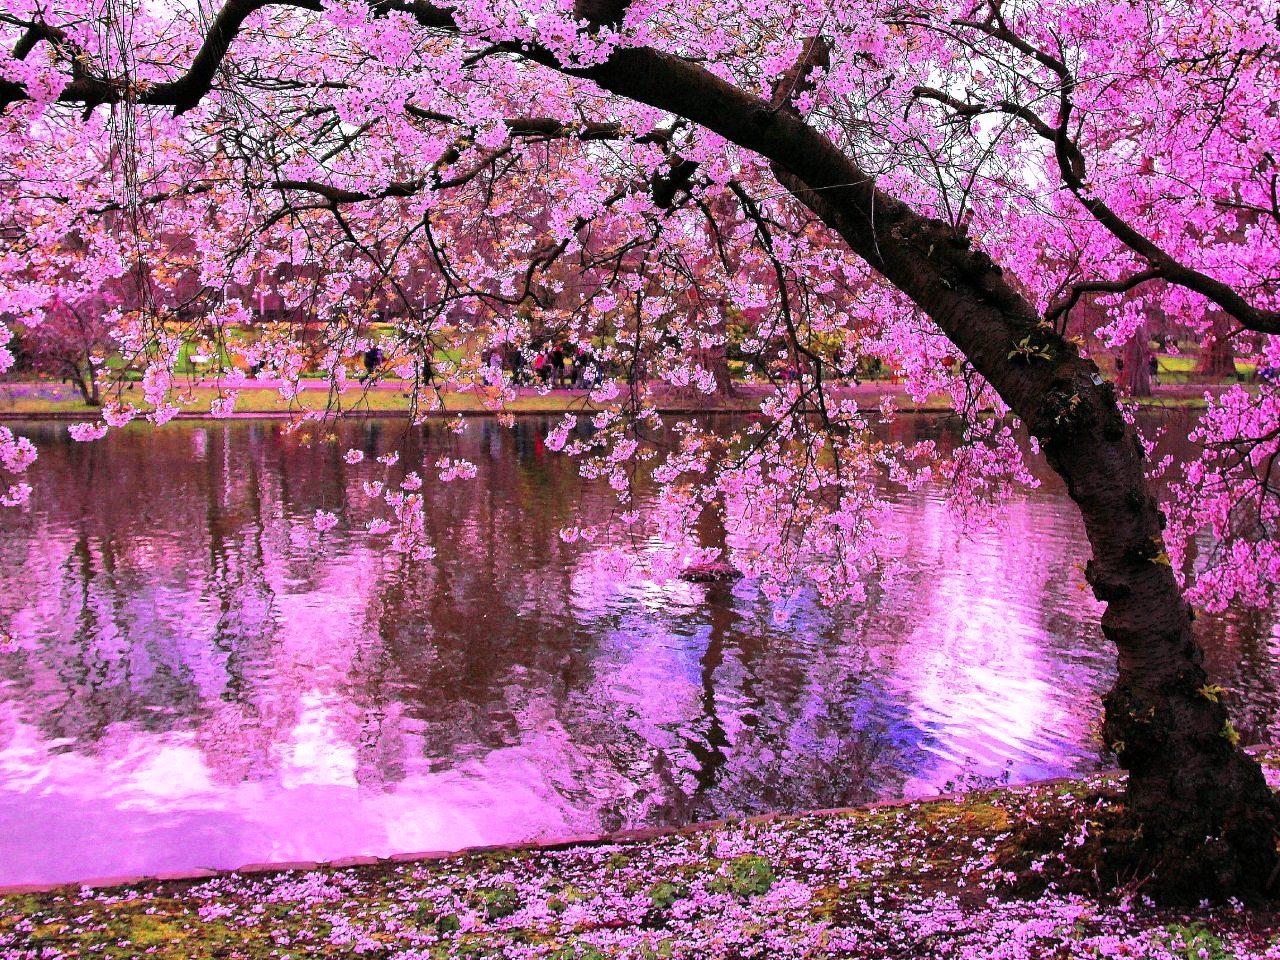 Desktop wallpaper hd nature pink